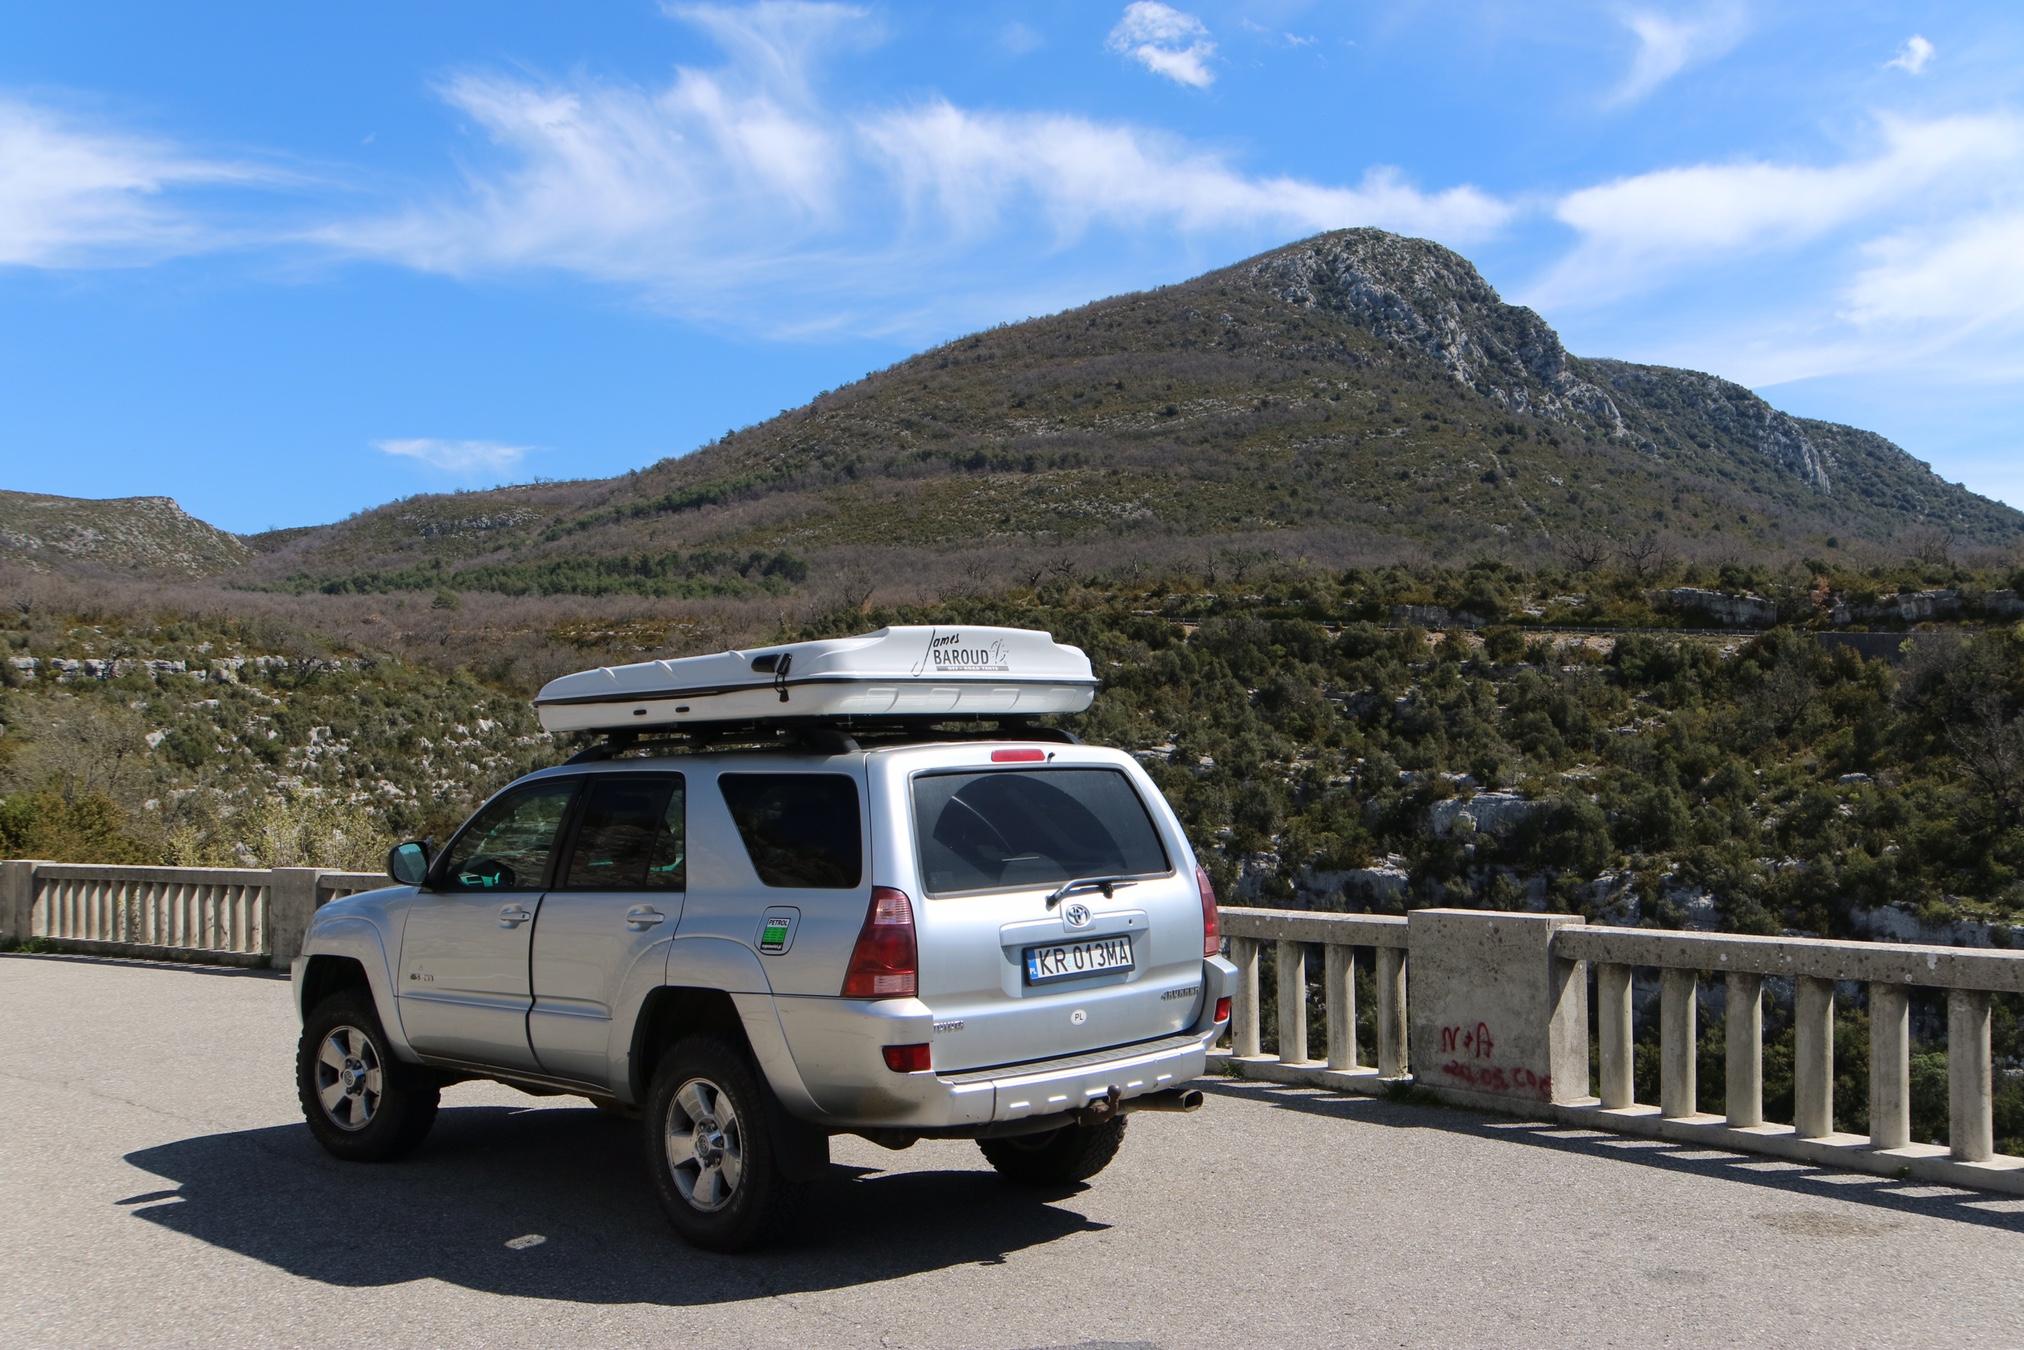 Namiot na dach auta [Archiwum] Africa Twin Forum POLAND